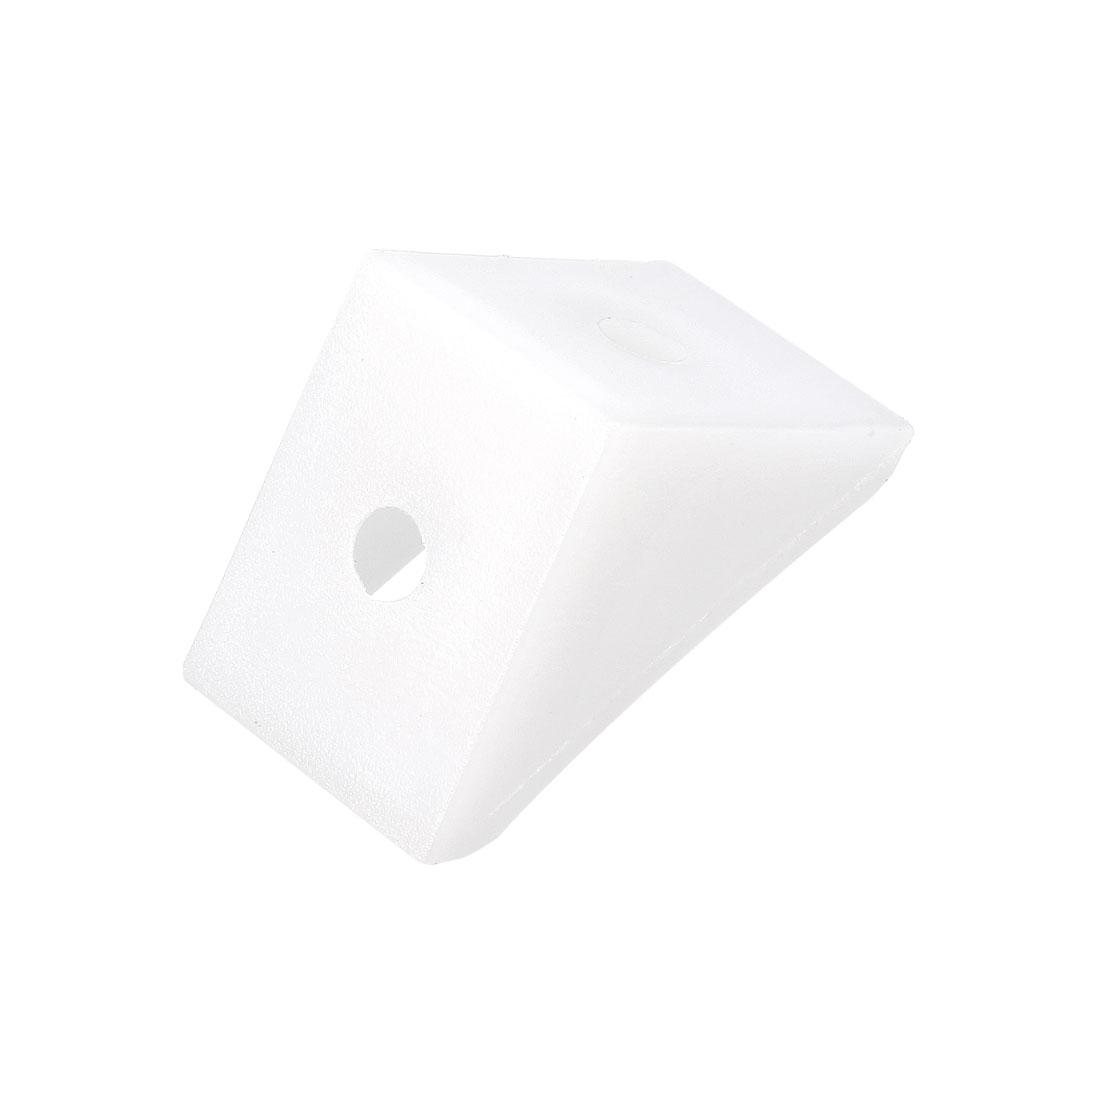 Shelf Cabinet Door 90 Degree Plastic Corner Braces 2 Holes Angle Bracket, 20 Pcs